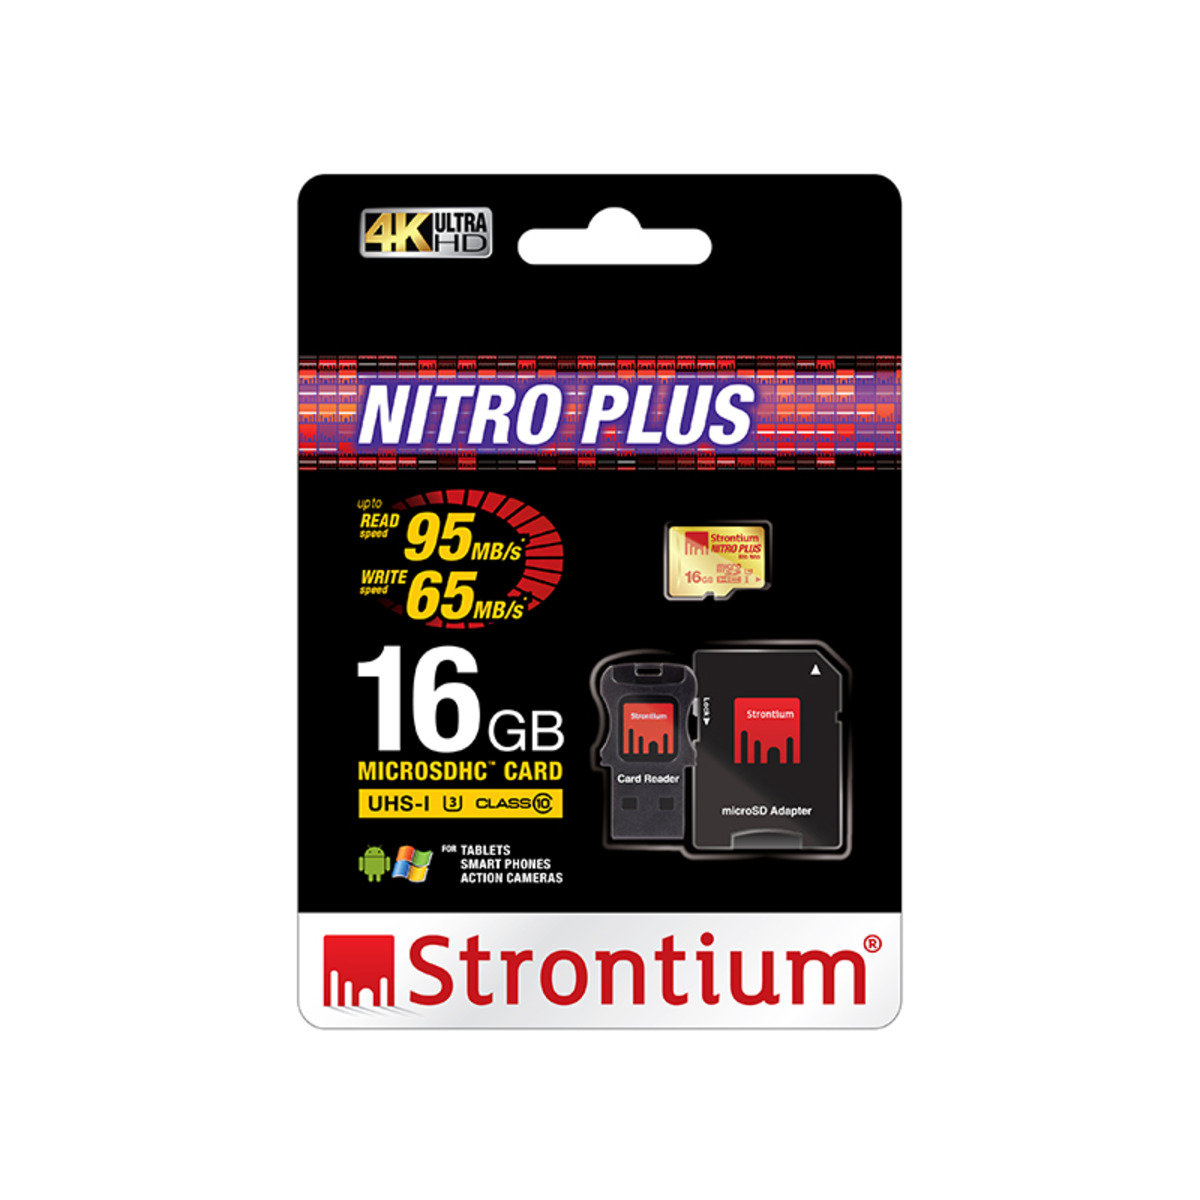 NITRO PLUS 16GB UHS-1 (U3) Class 10 micro SD SDHC 超高速4K專用記憶卡